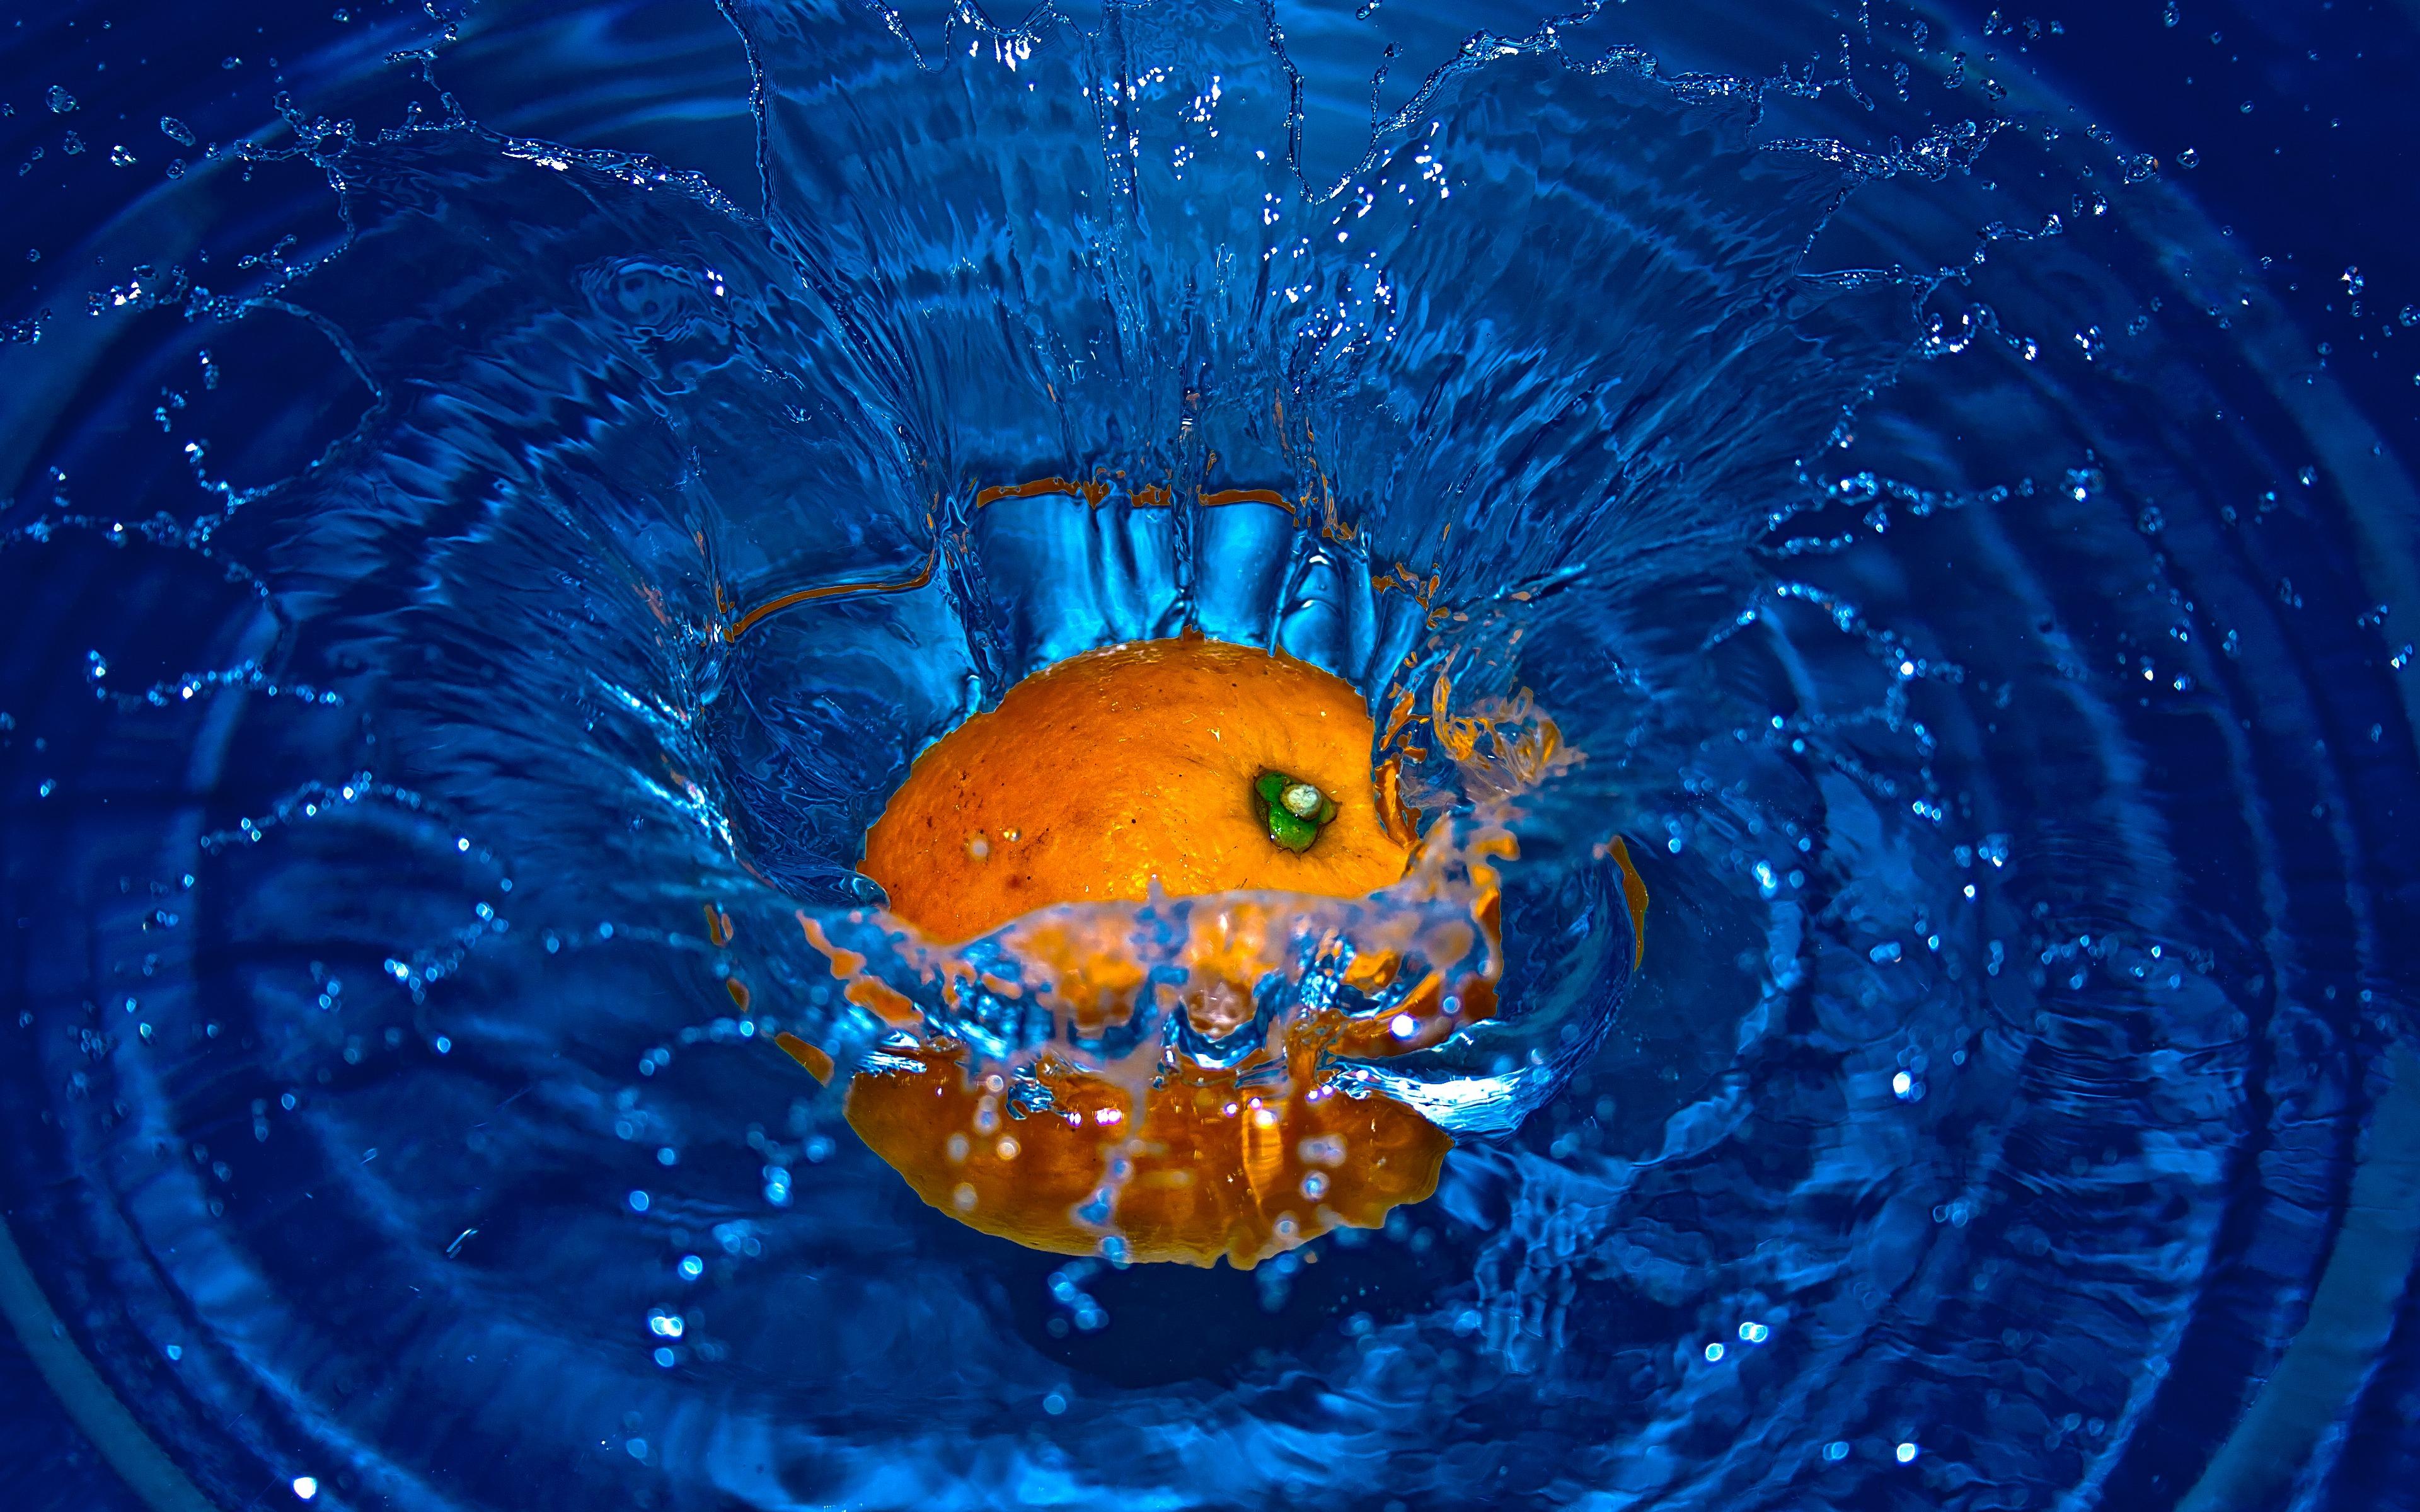 4k water wallpapers high quality download free - Aquatic wallpaper ...